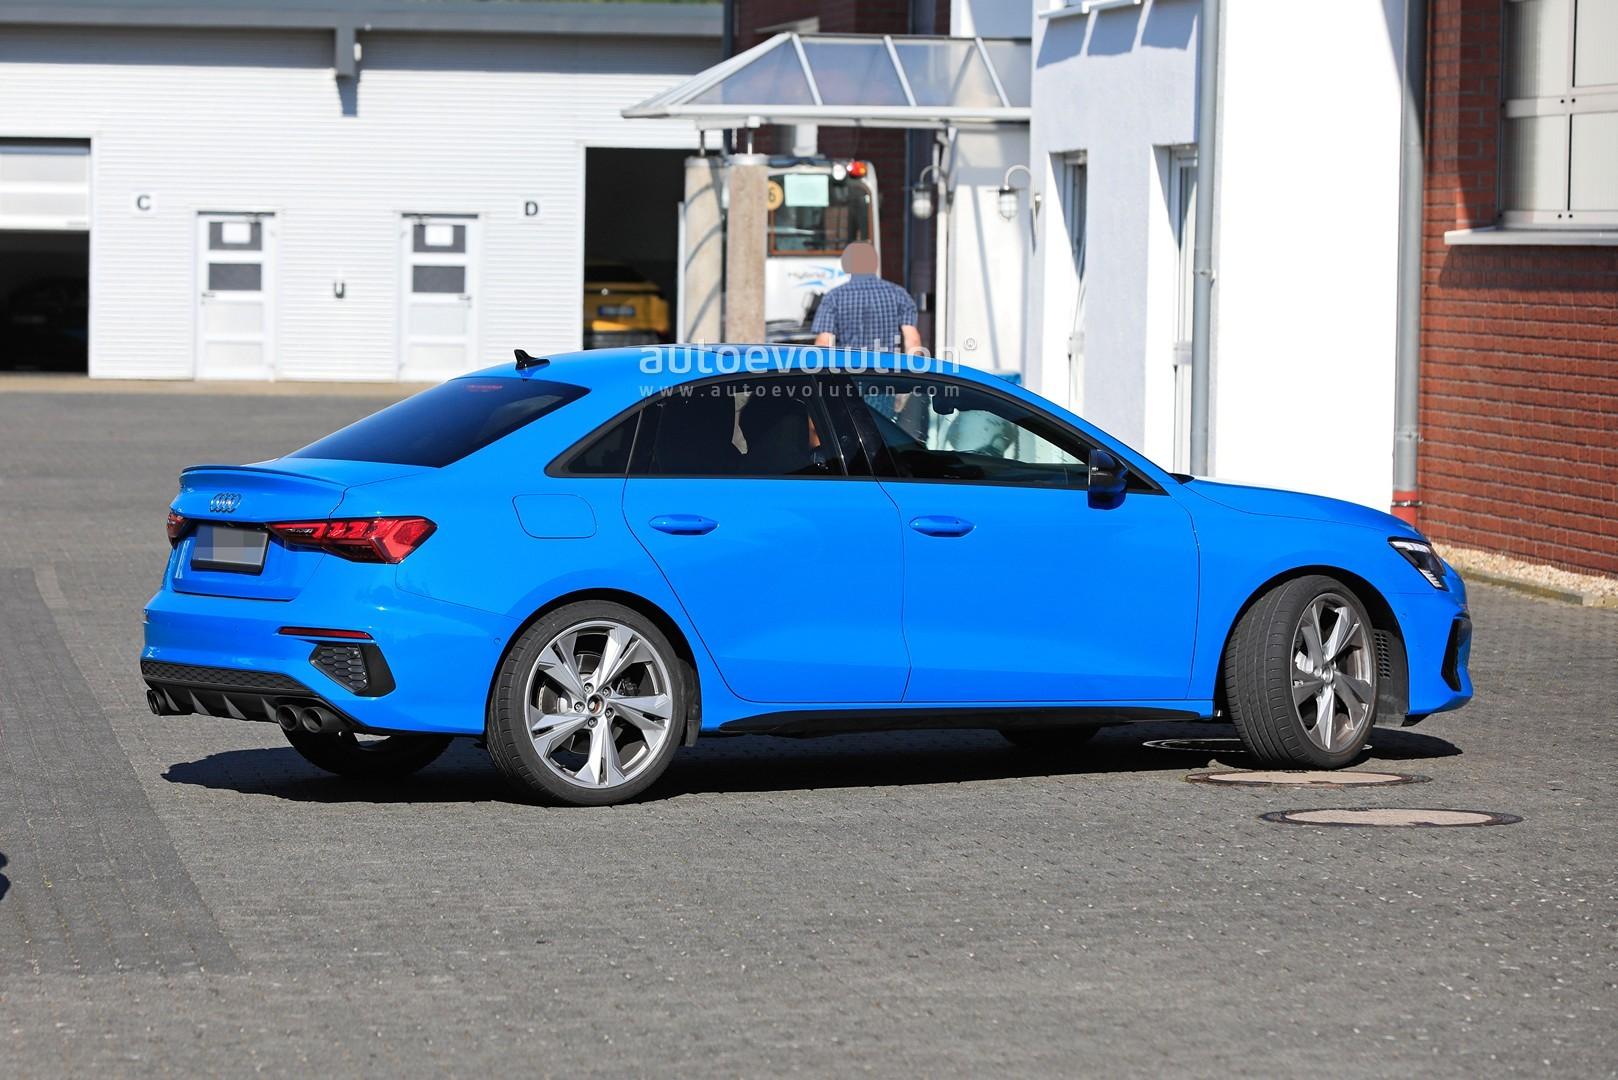 Manual Audi S3 Sedan Is Faster than 2015 Subaru WRX STI ...